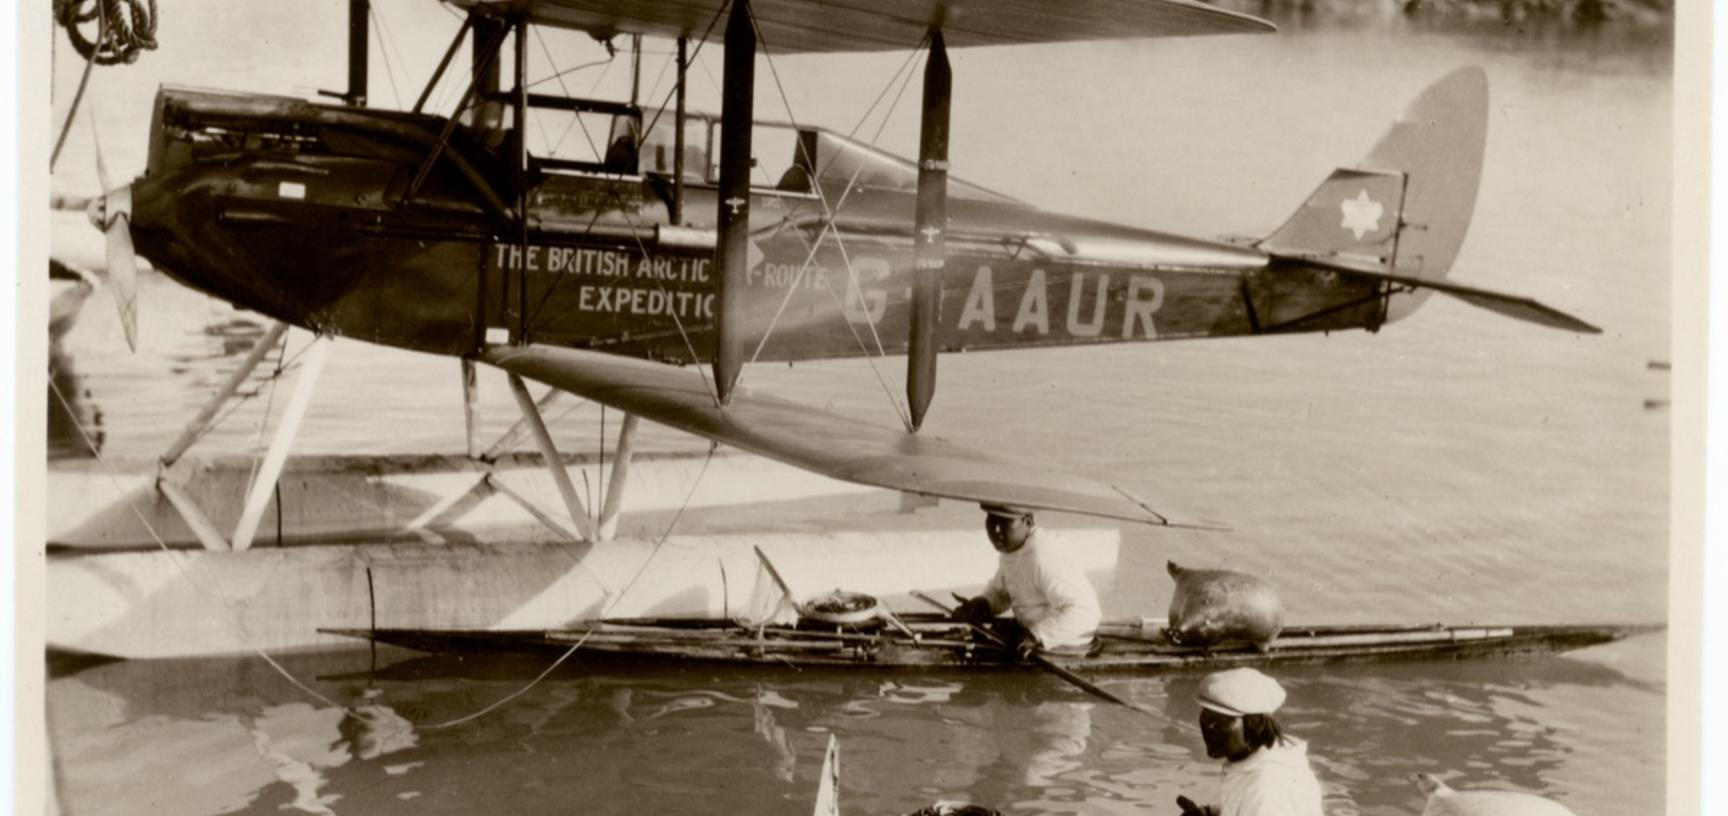 De Havilland Moth biplane, shown here with landing gear of water floats.